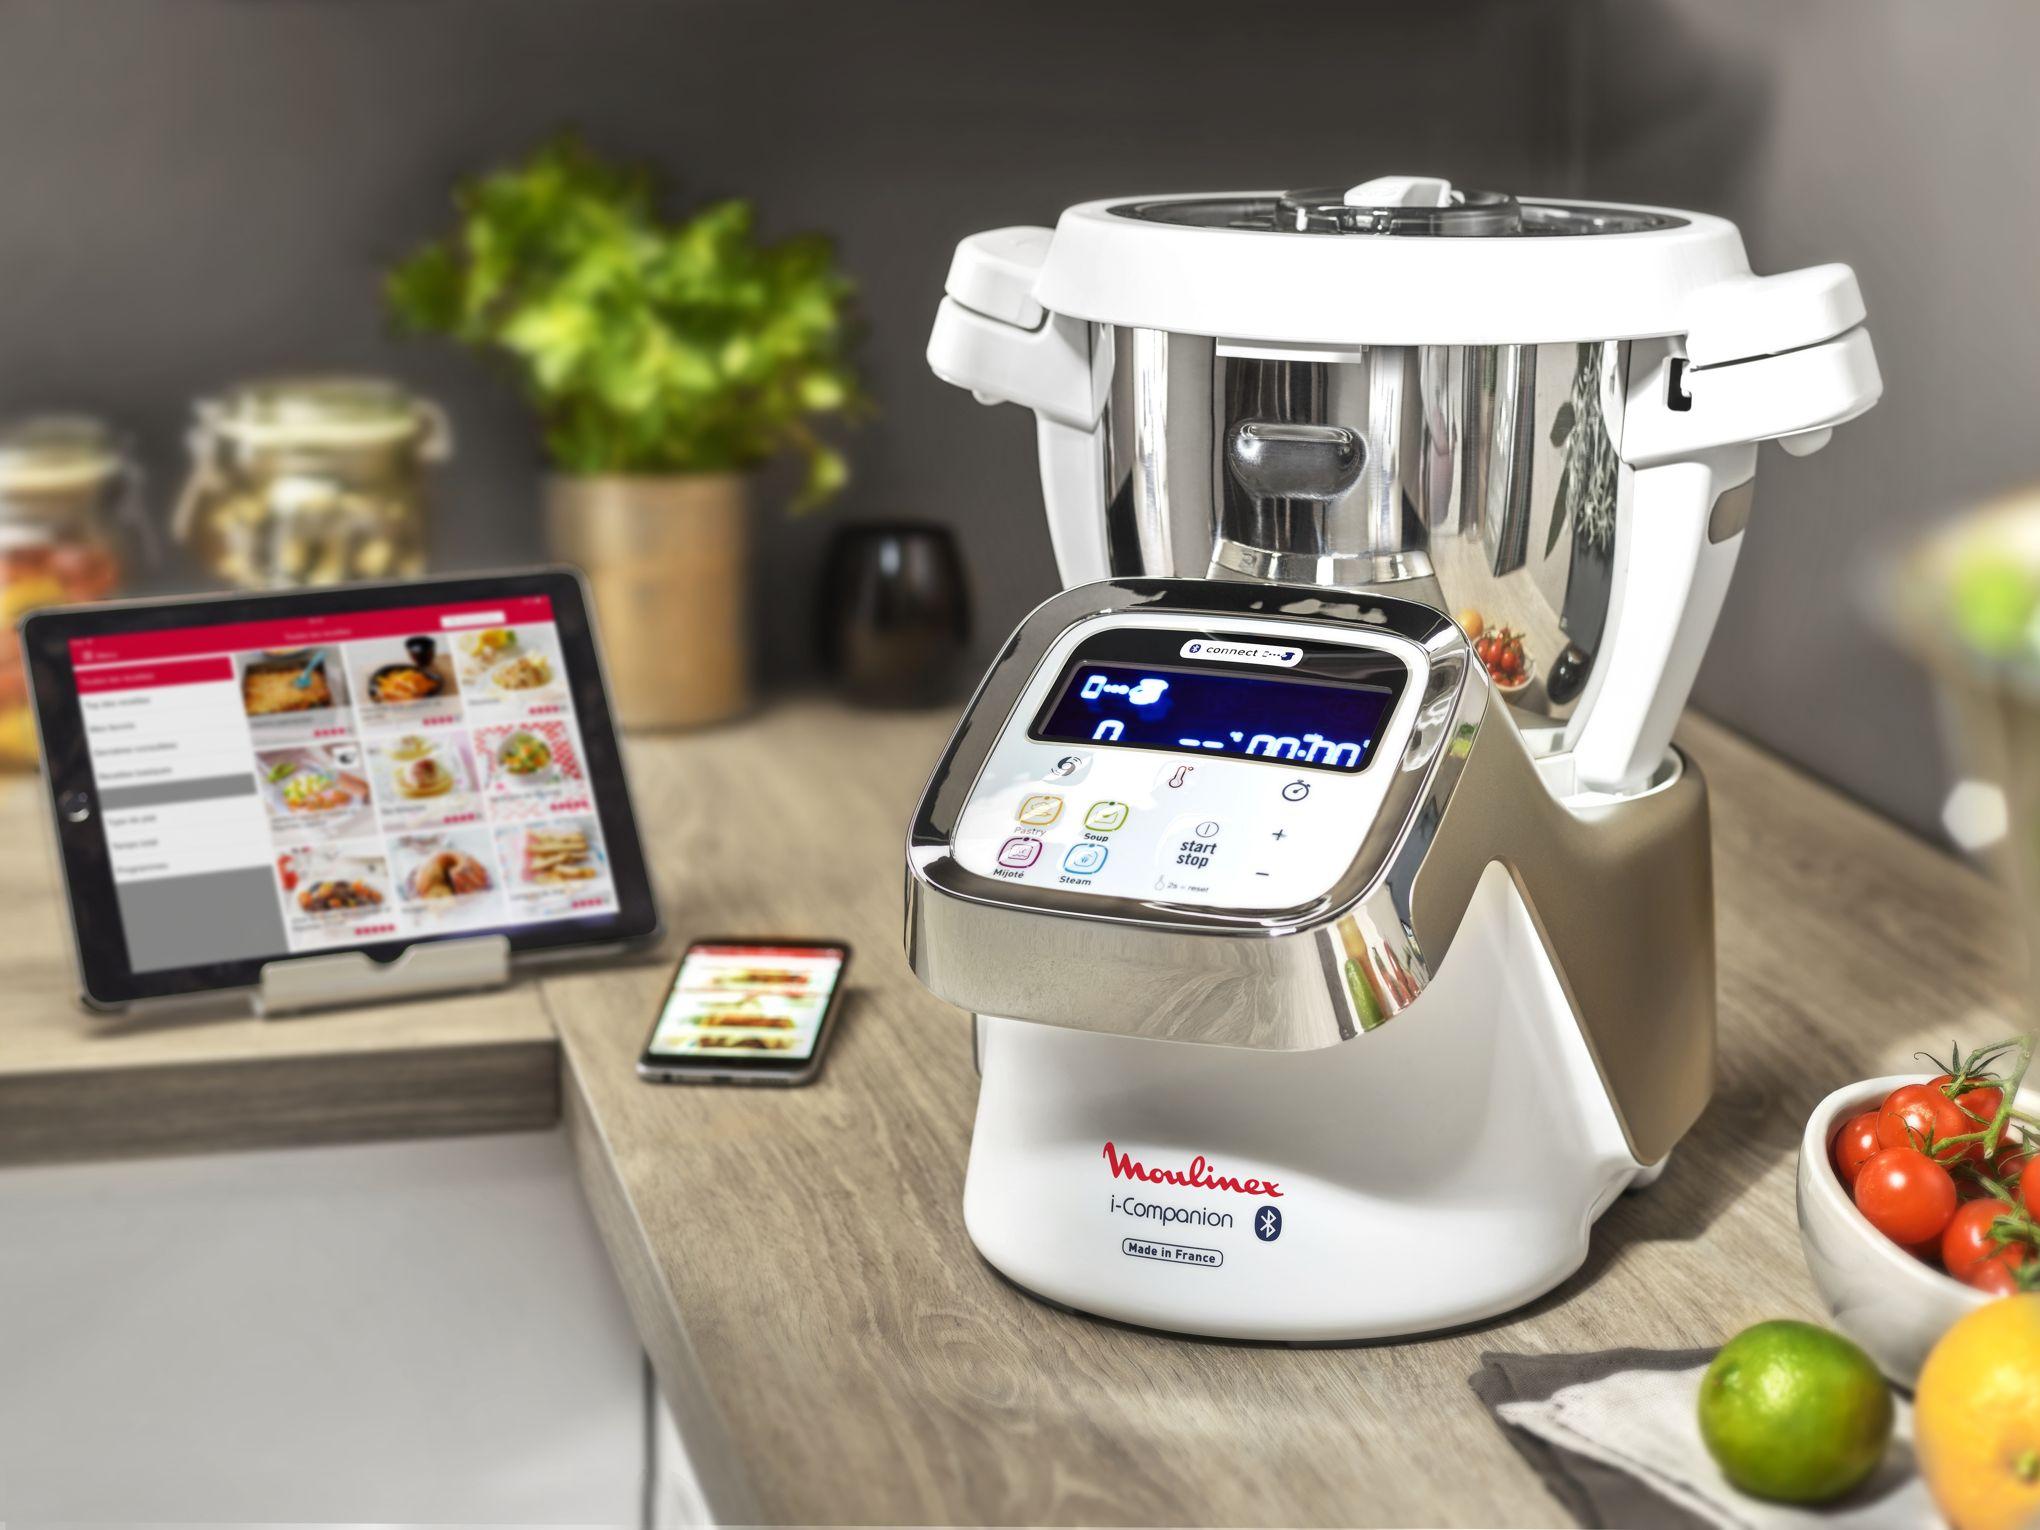 robot cuisine vorwerk prix robot cuisine vorwerk prix with robot cuisine vorwerk prix free. Black Bedroom Furniture Sets. Home Design Ideas